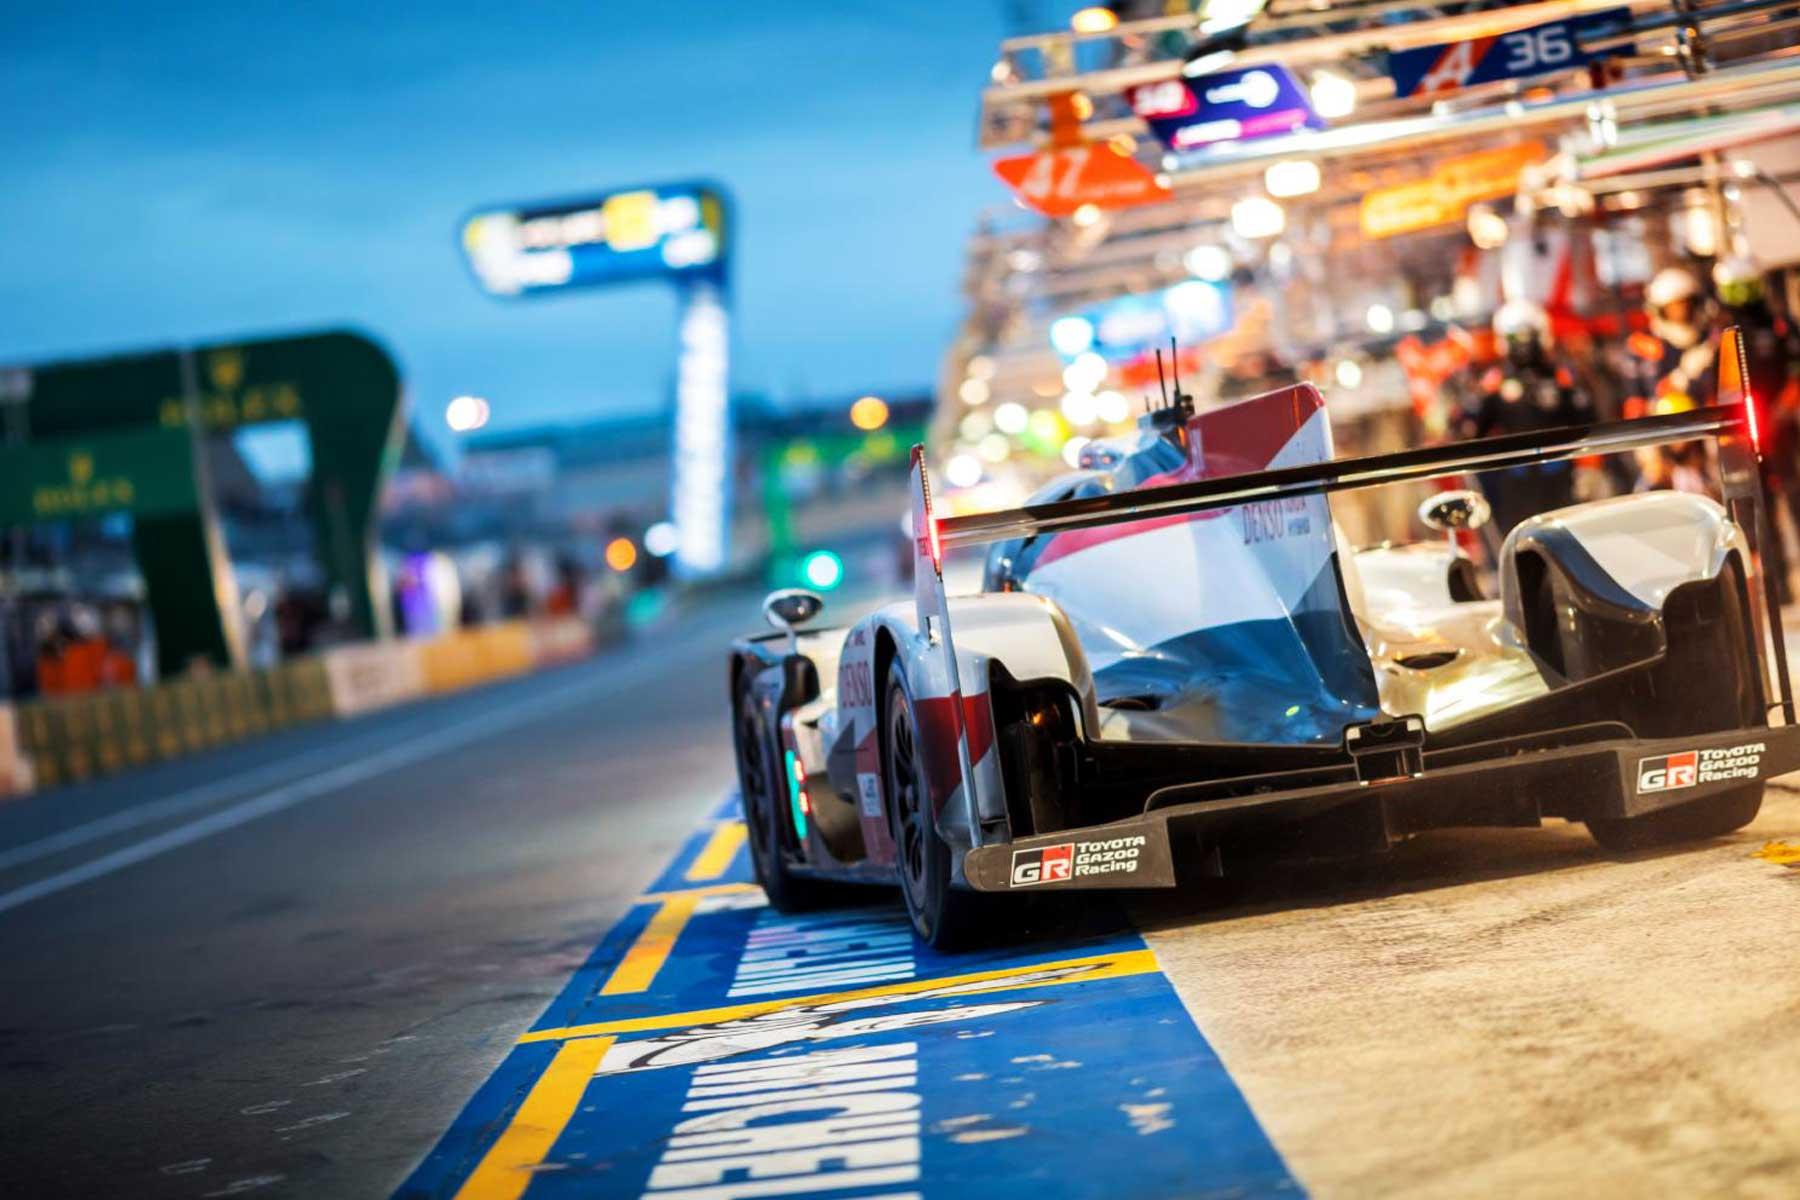 Le Mans – Fly Billund – via Paris